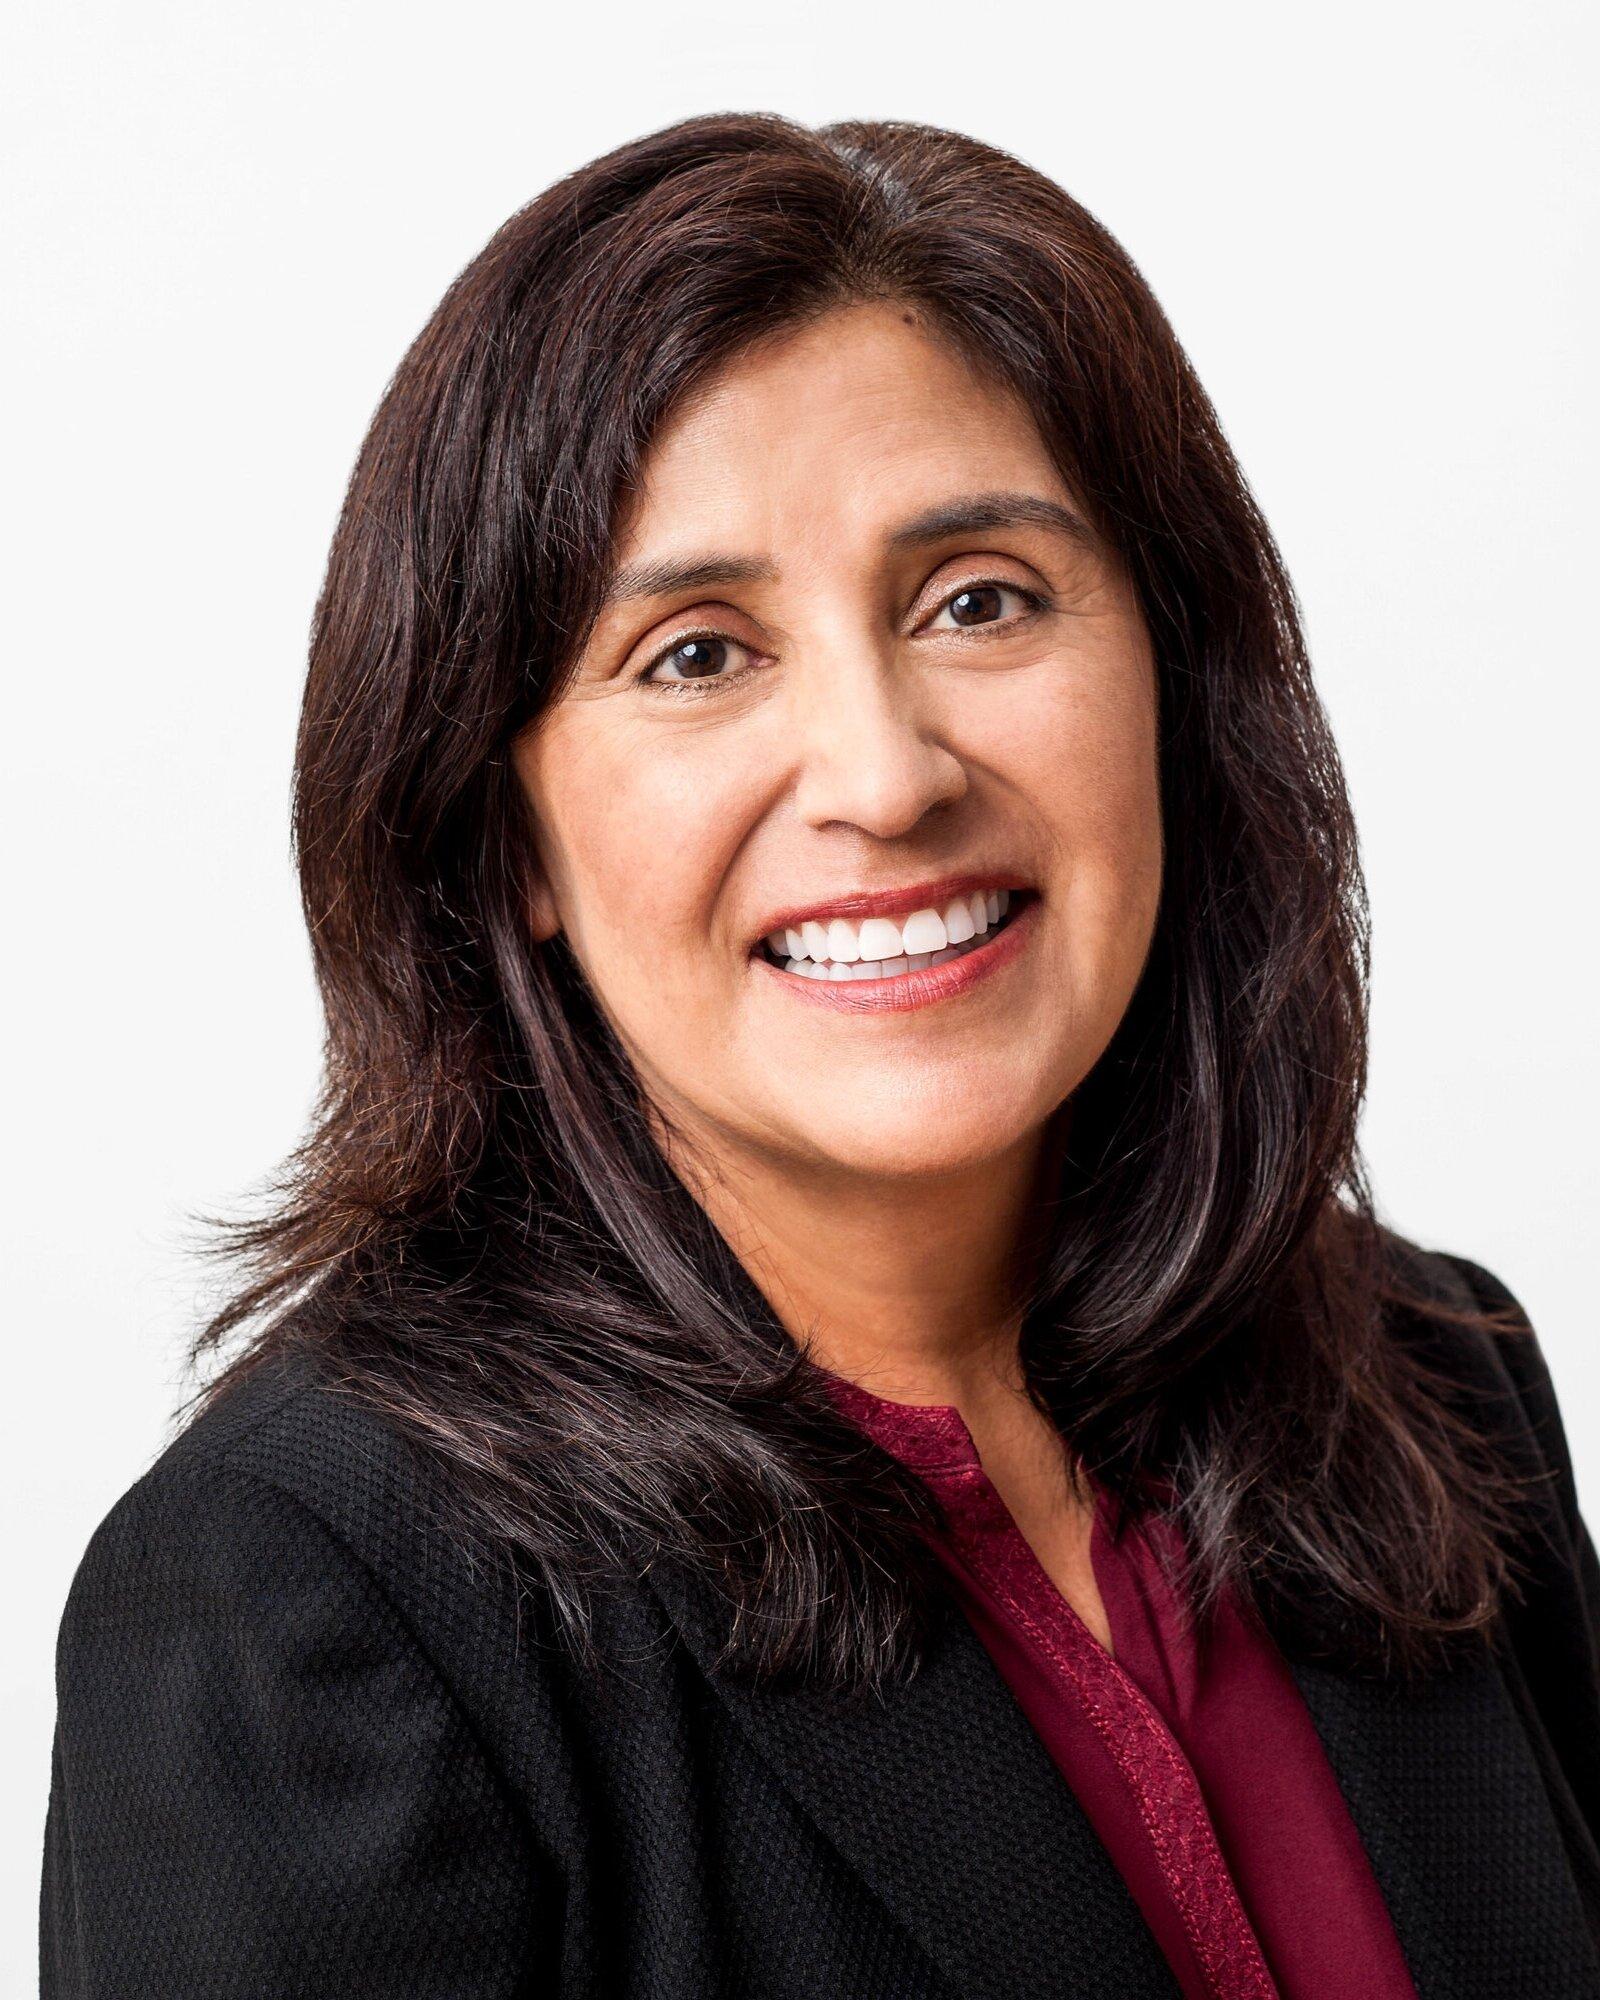 MargaritaRuiz-Lum - Senior Manager, Indirect TaxGoogle